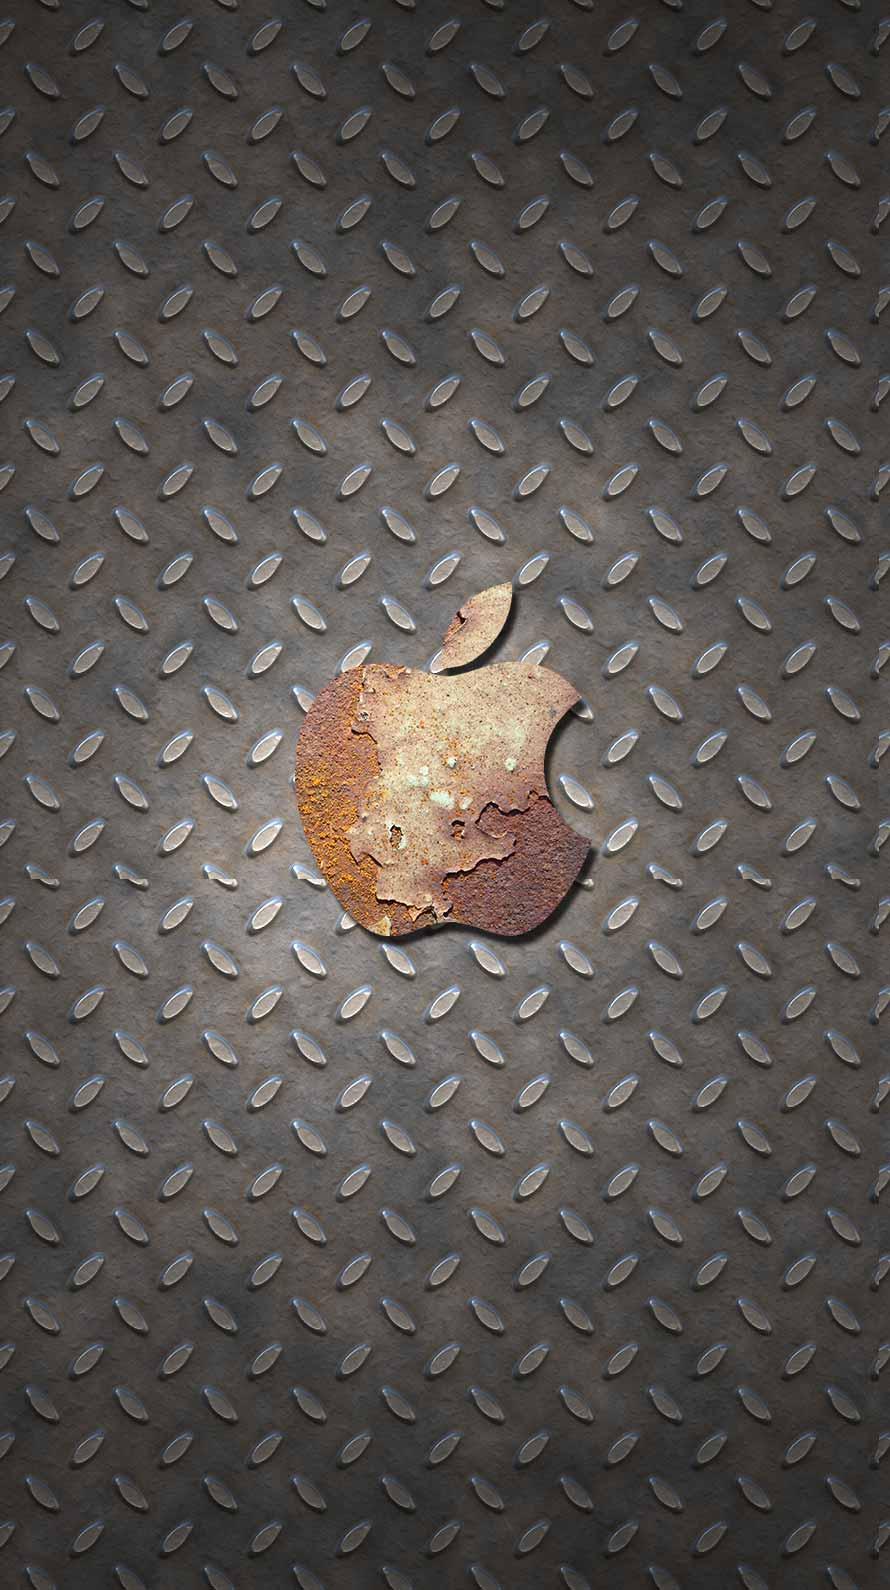 Iphone用 錆た金属とメタルで廃工場風のオリジナル壁紙 スマホlabo